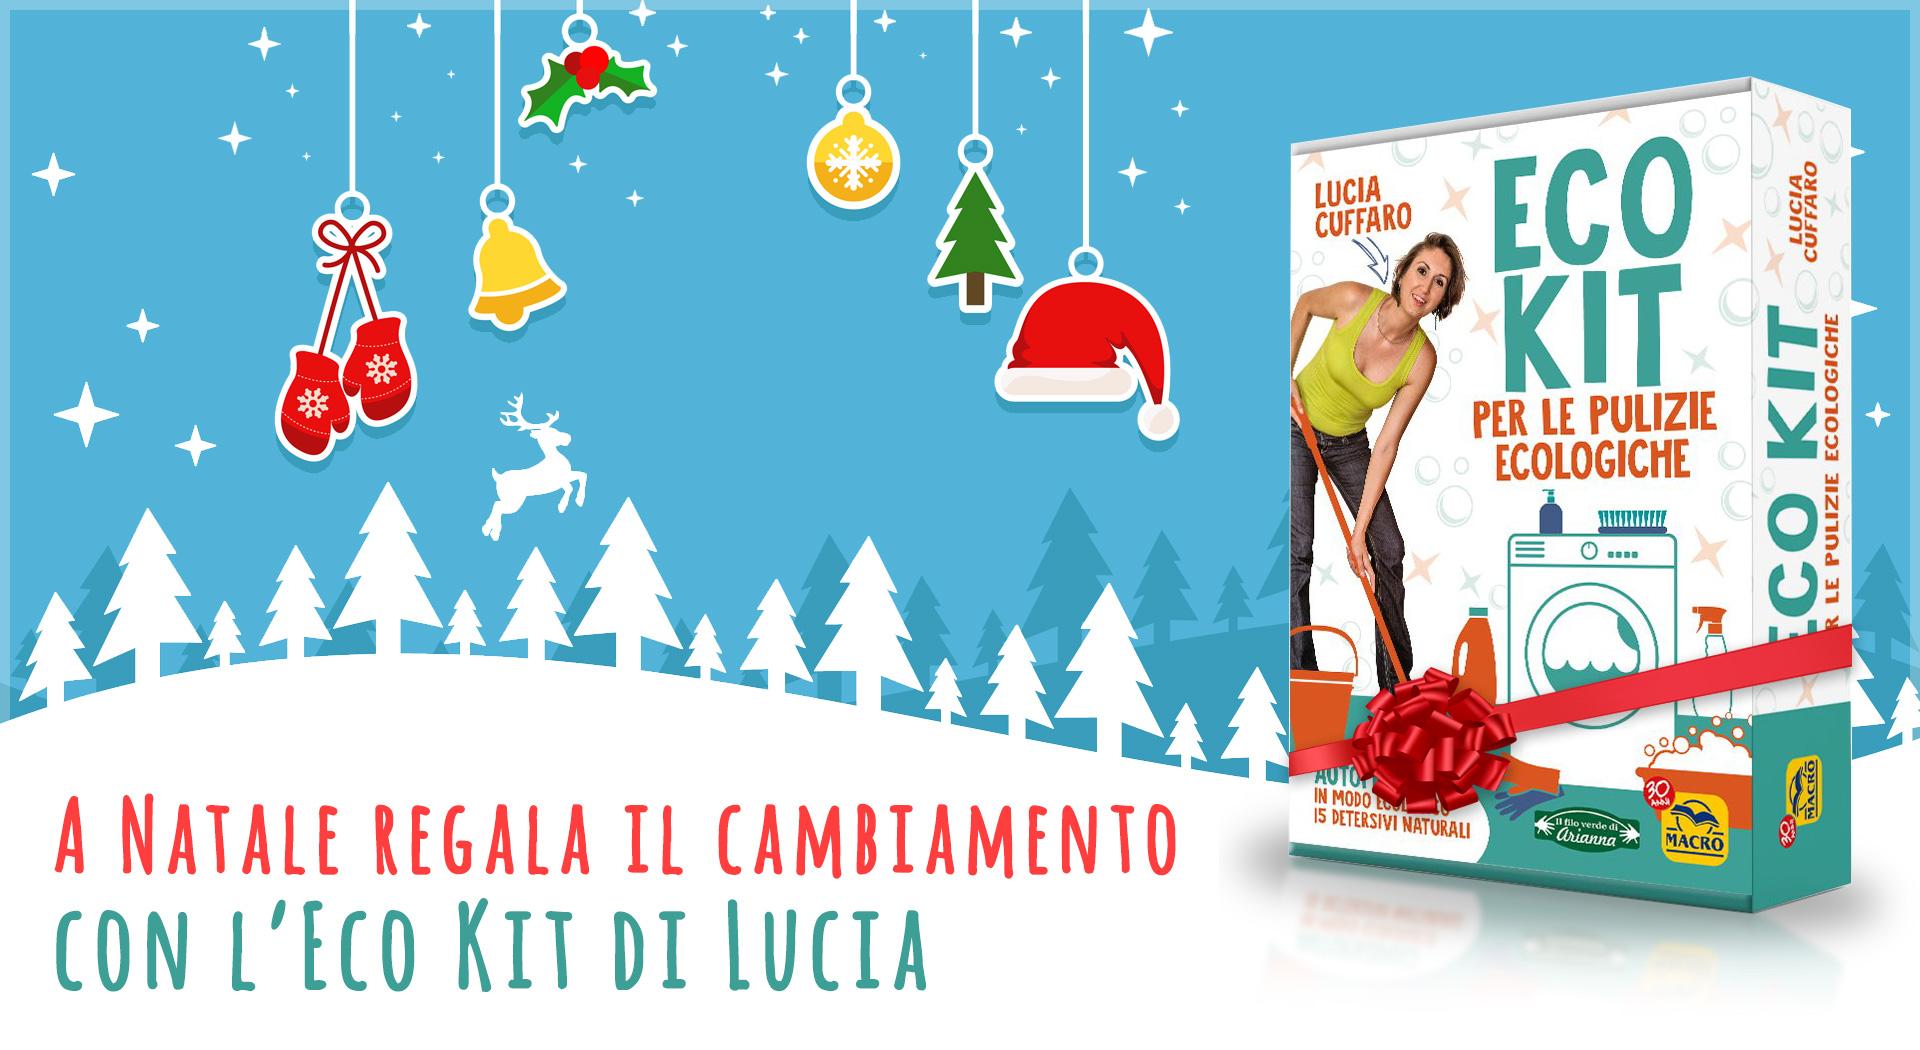 Eco Kit per le Pulizie Ecologiche - Natale